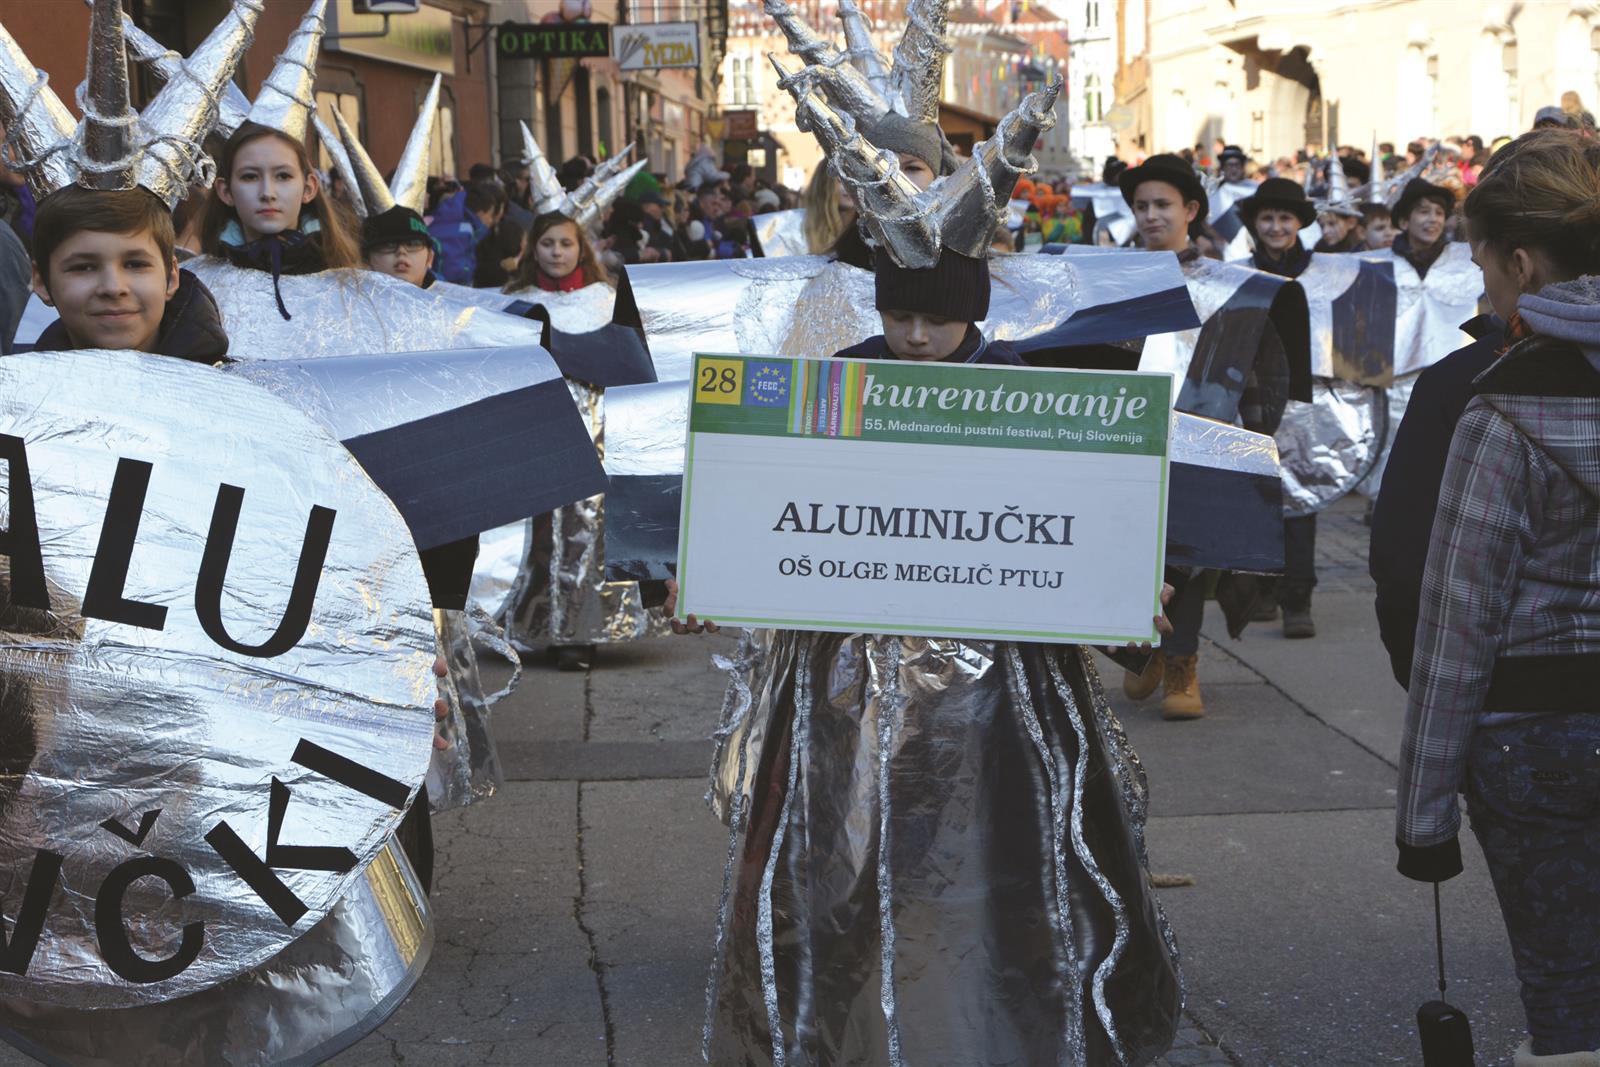 66_pust-2015-aluminijcki